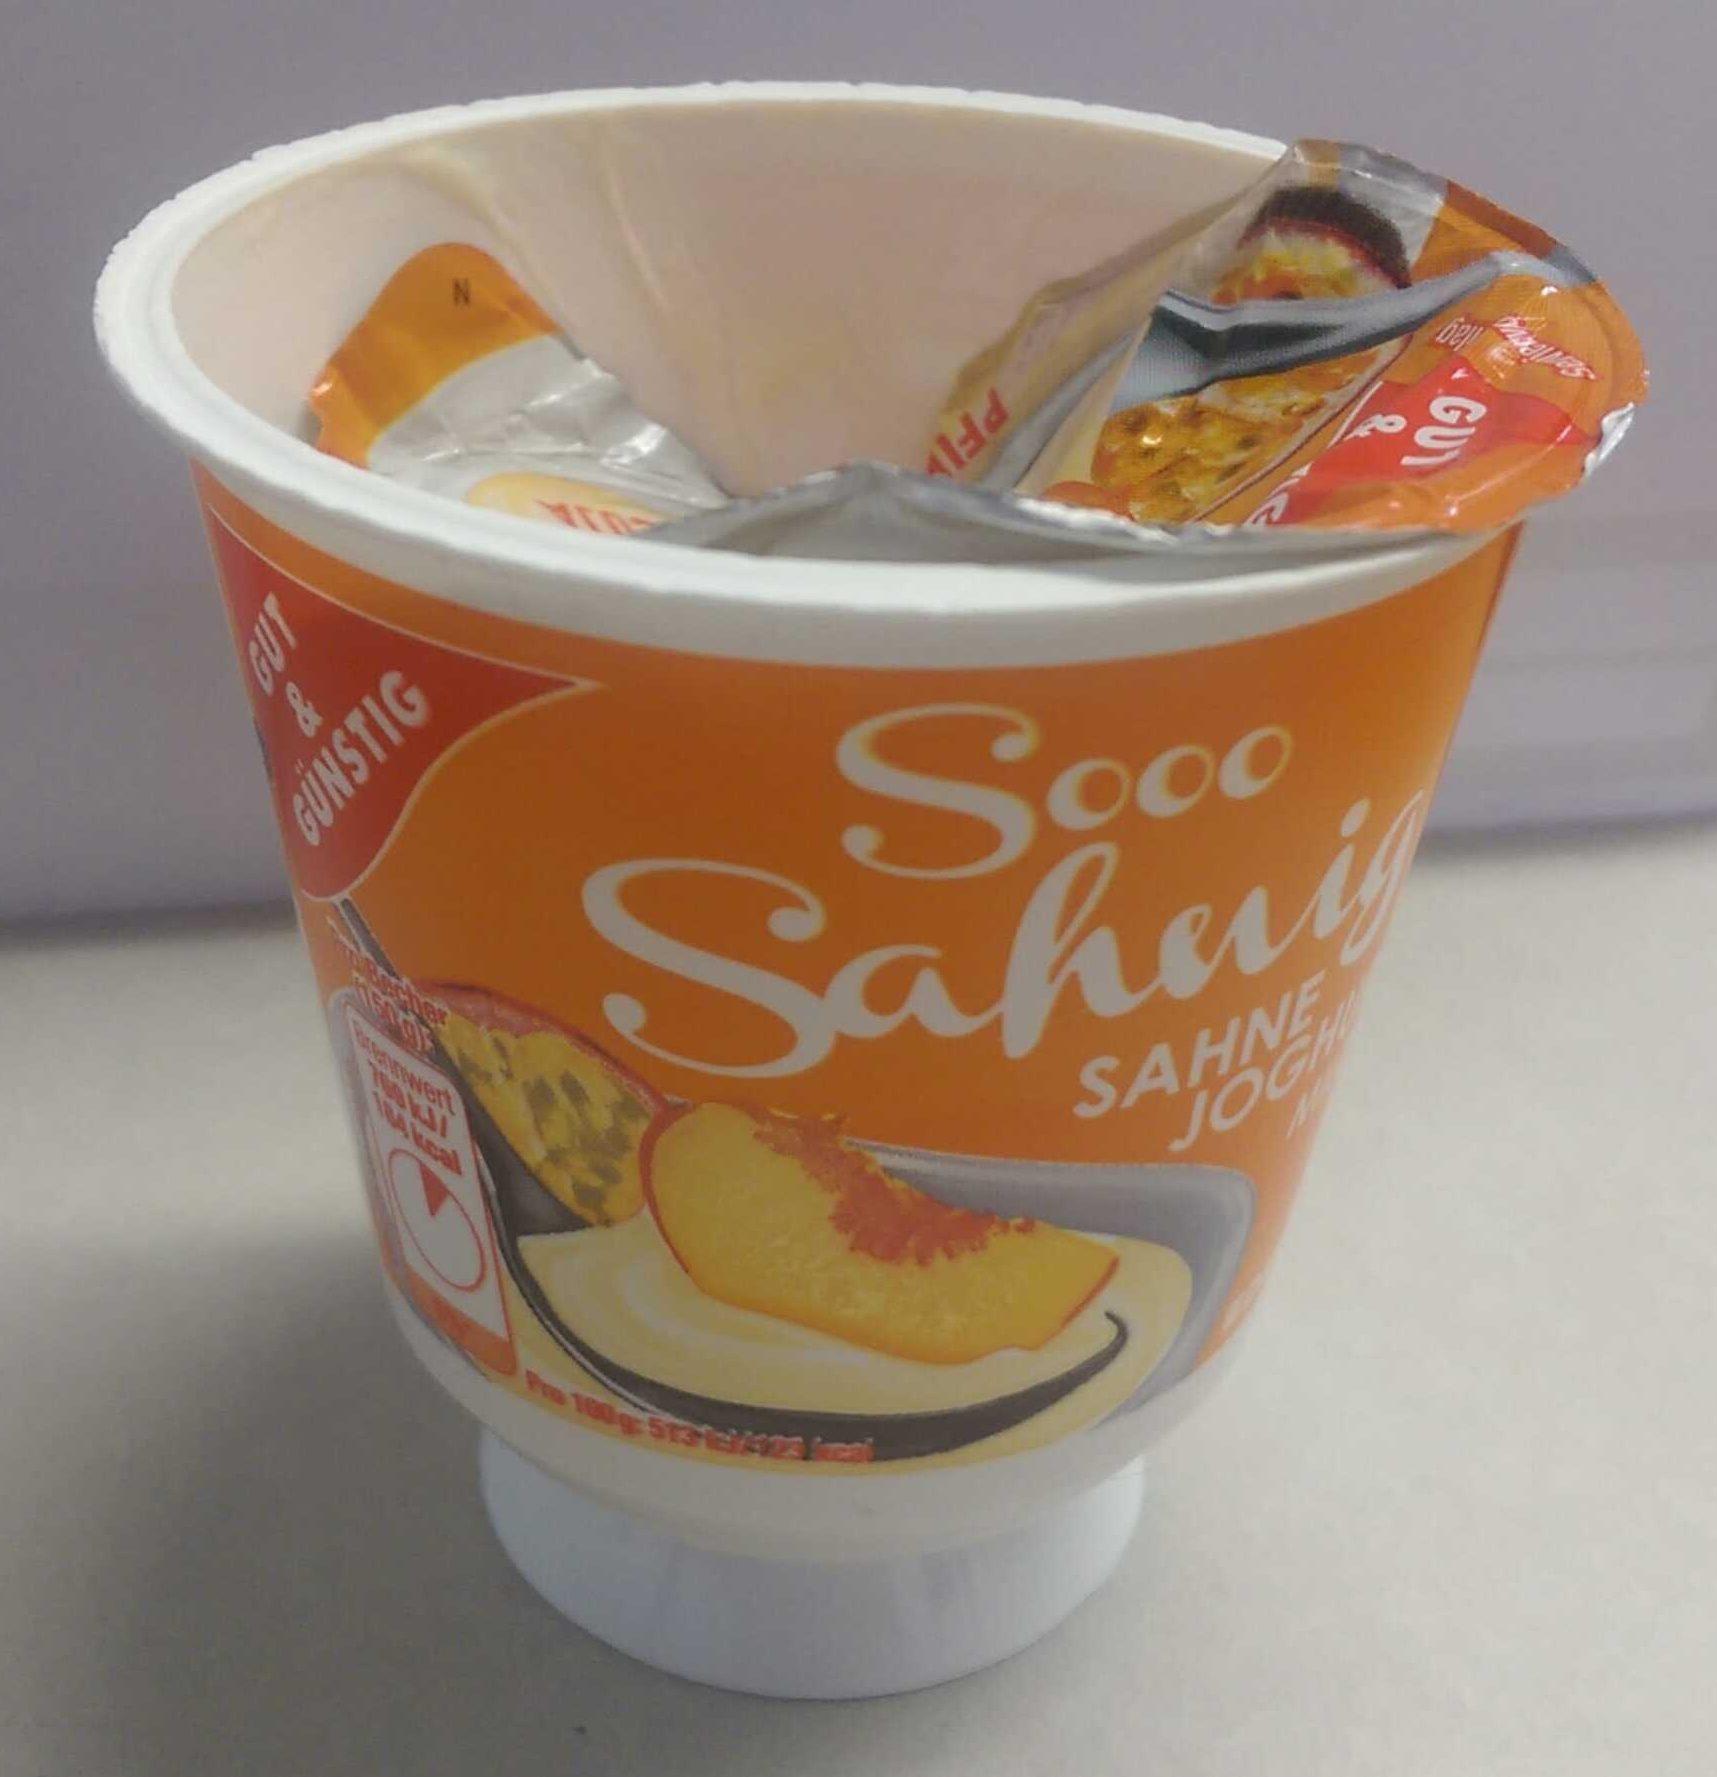 Sahnejoghurt Pfirsich-Maracuja G&G - Produit